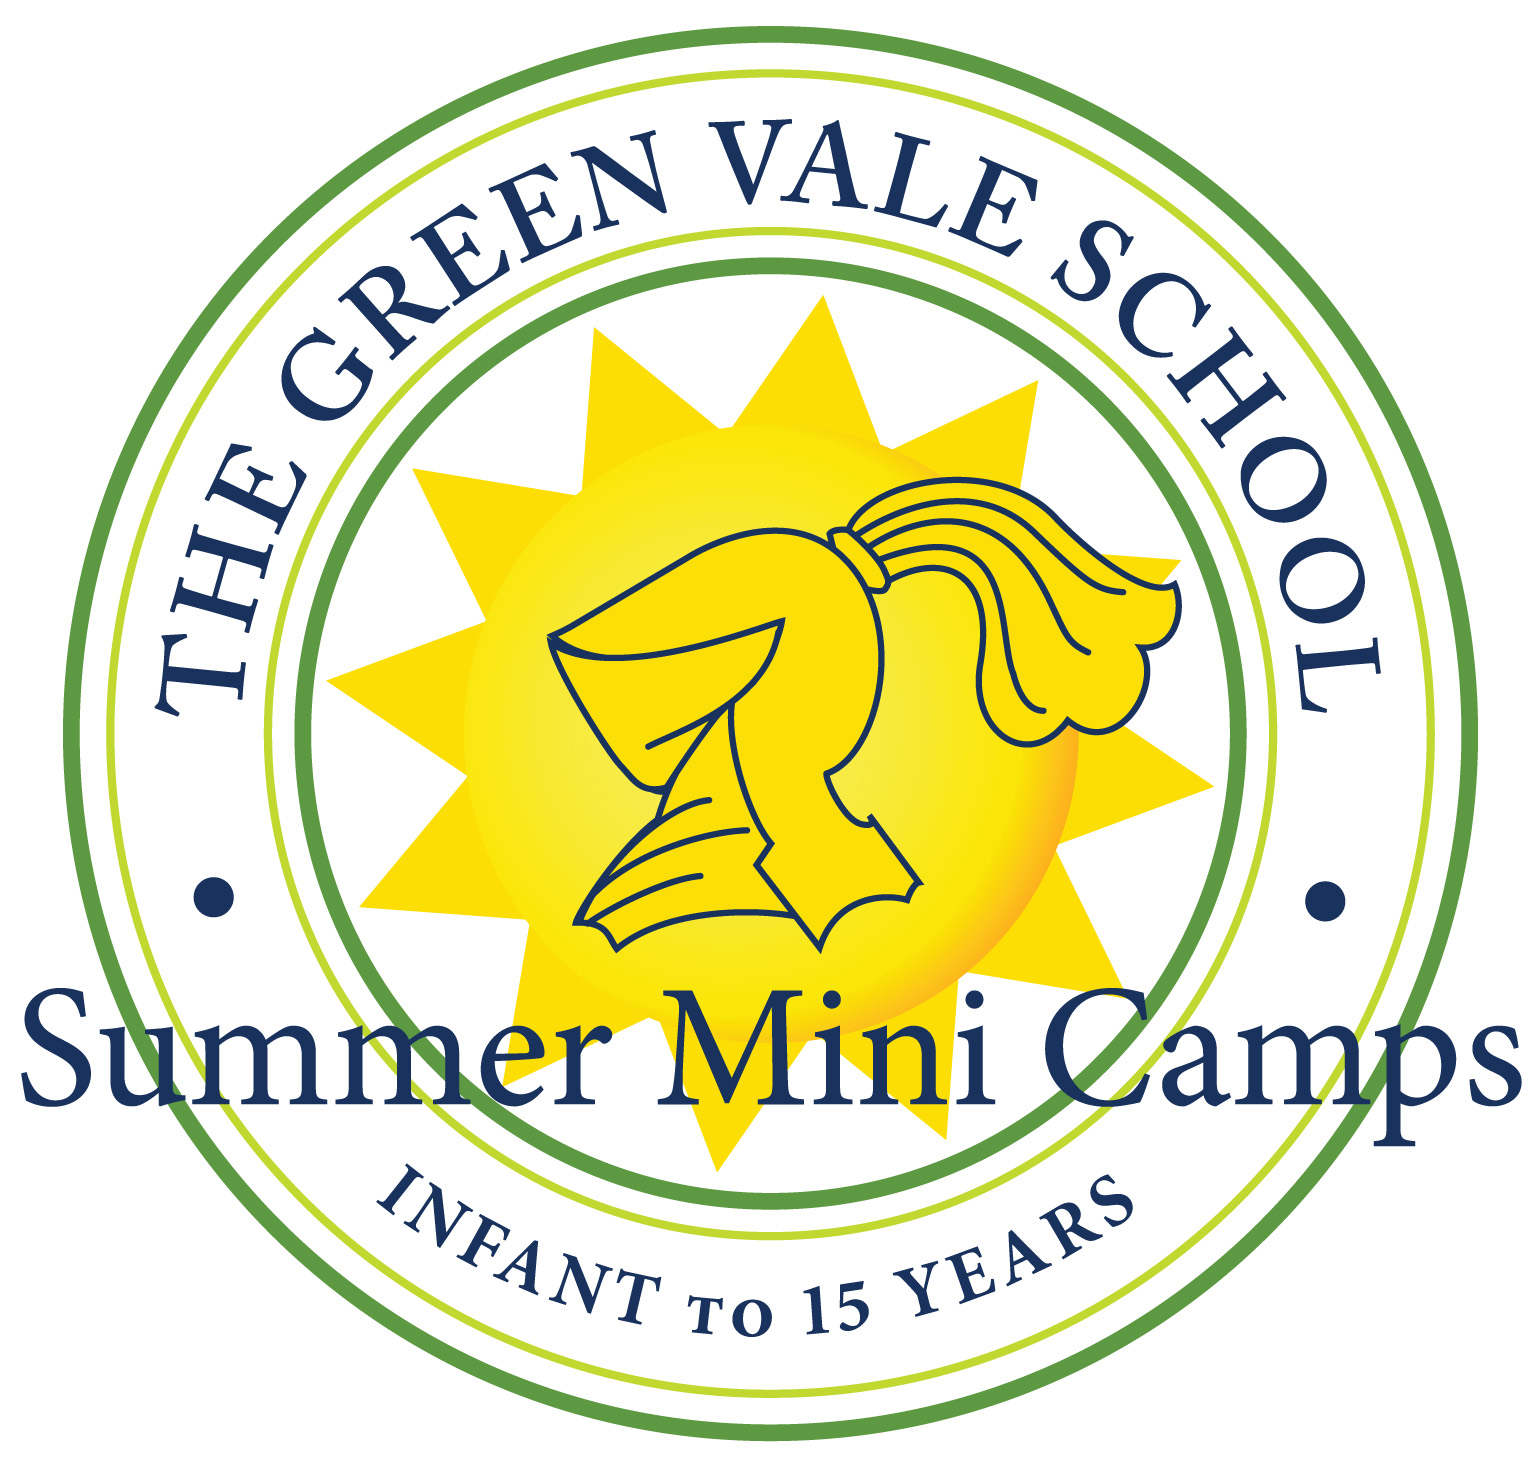 greenvale_camp.jpg